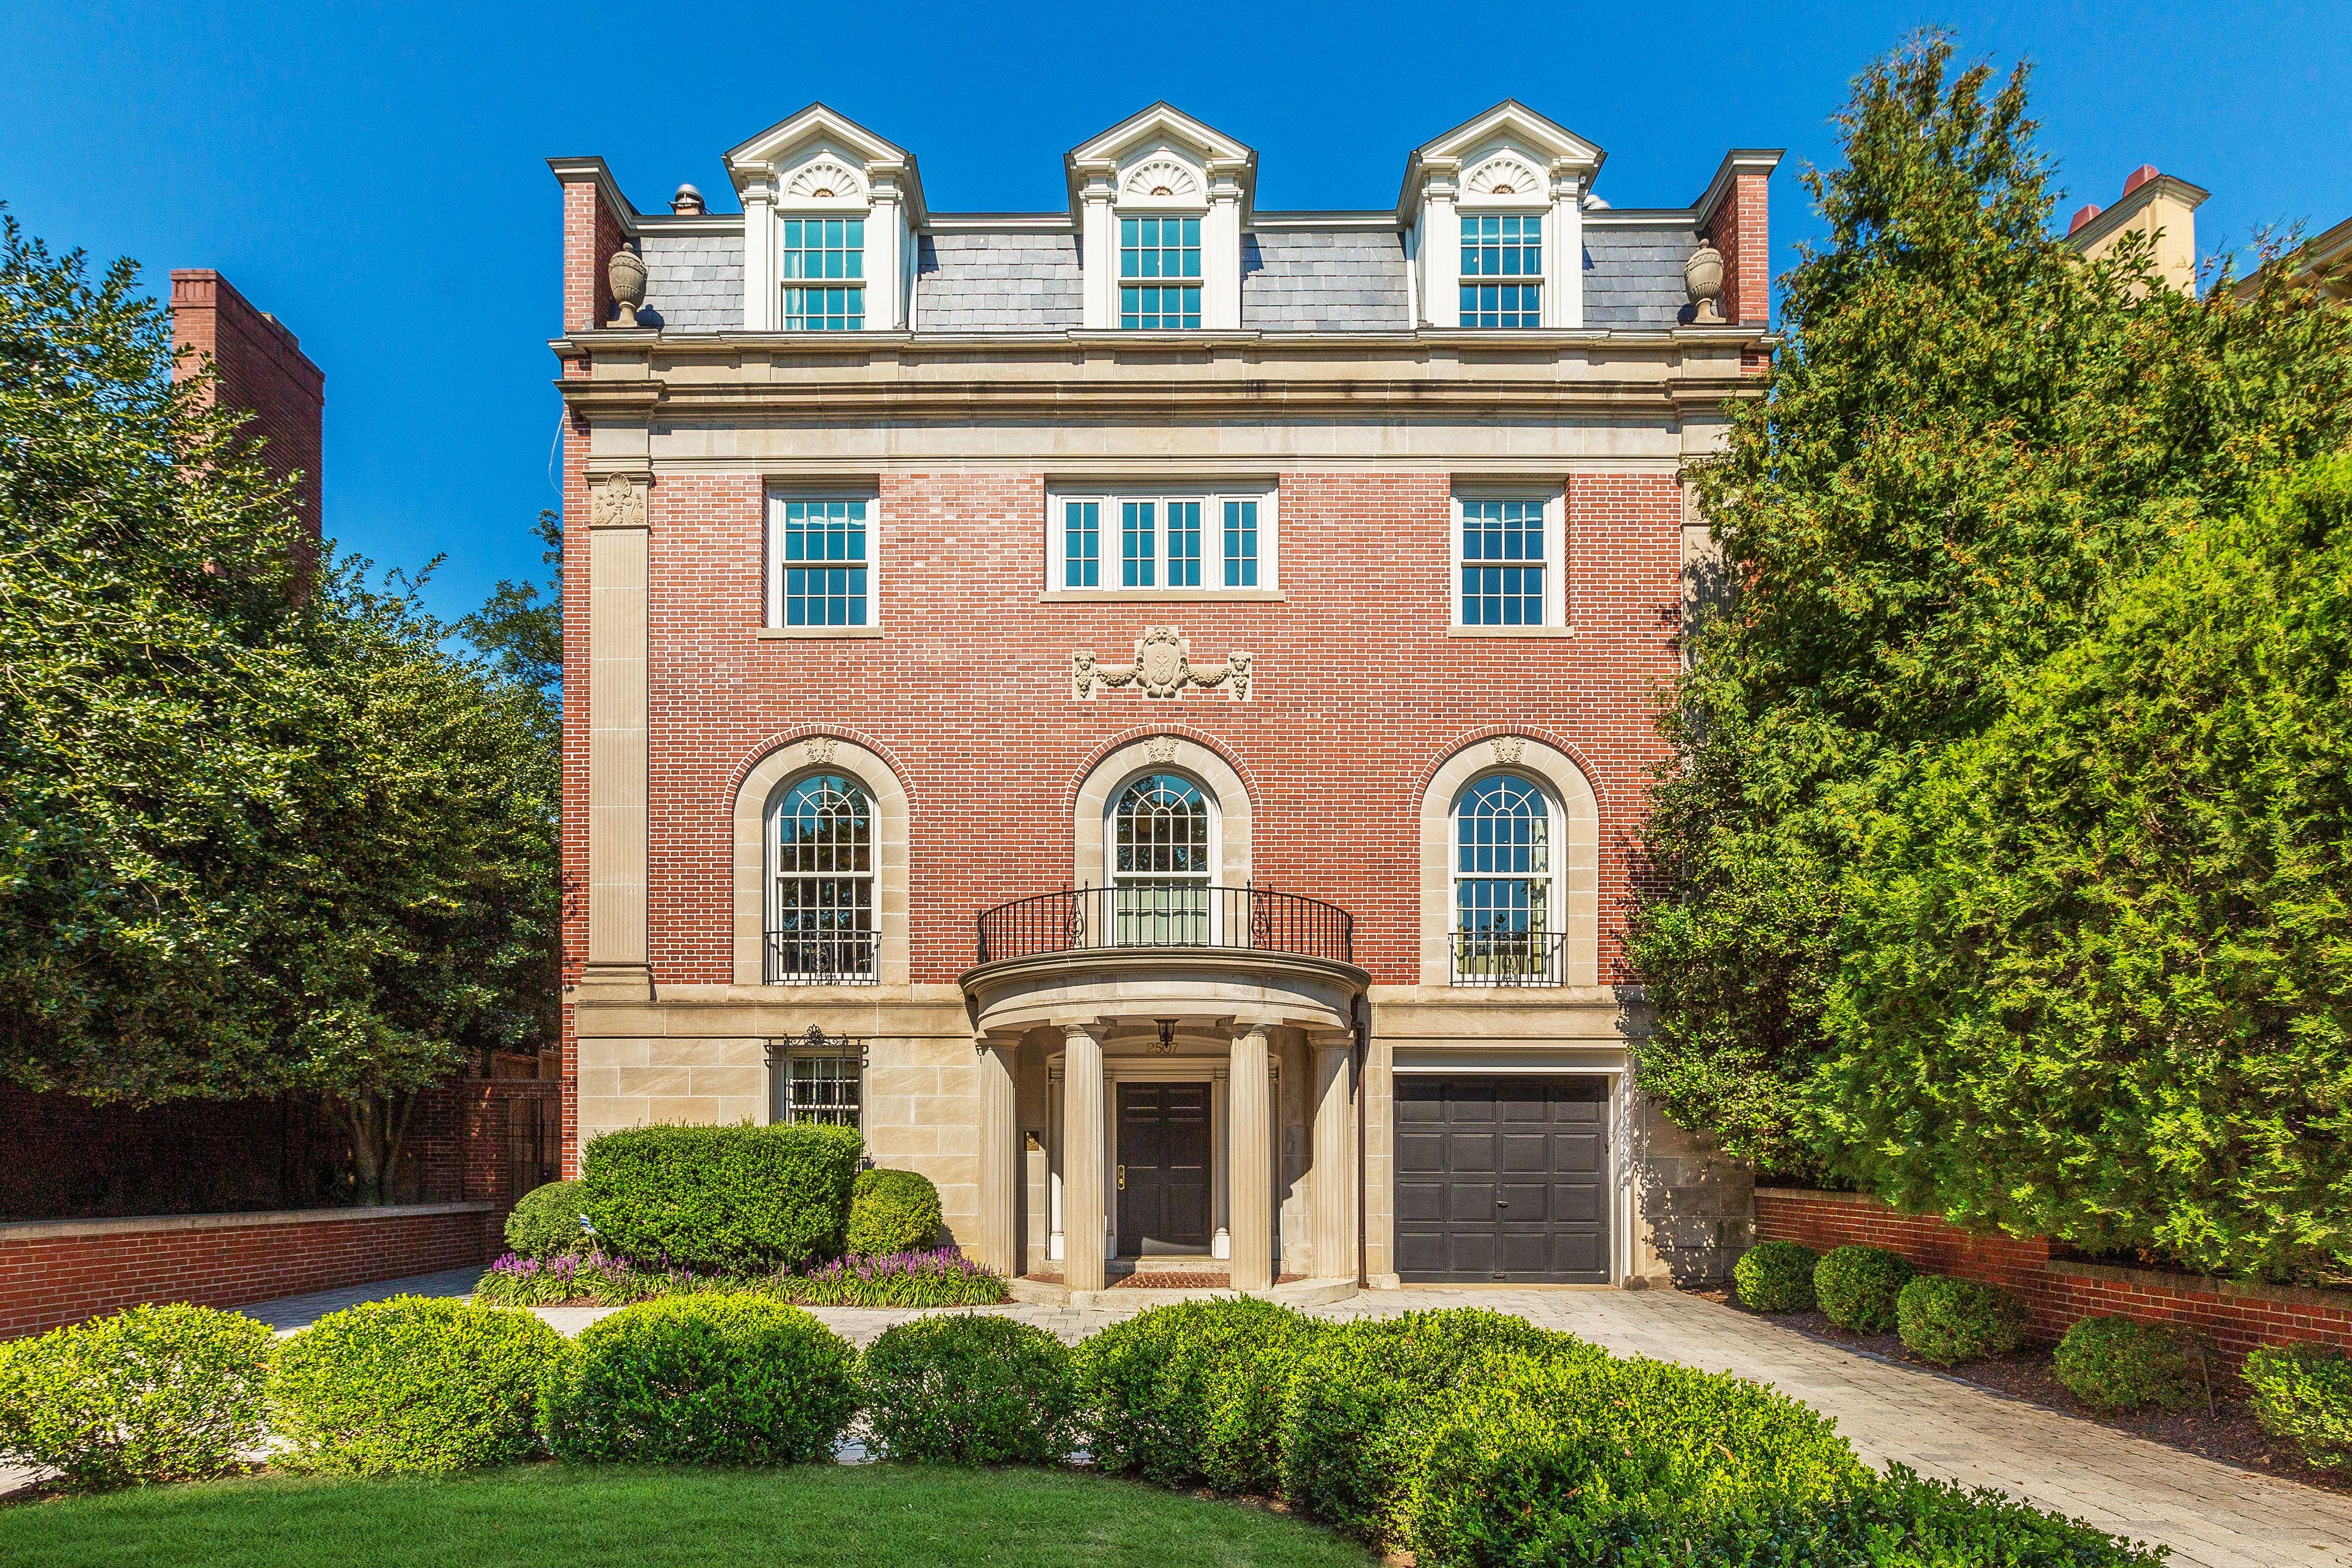 Ted Leonis' McLean Mansion